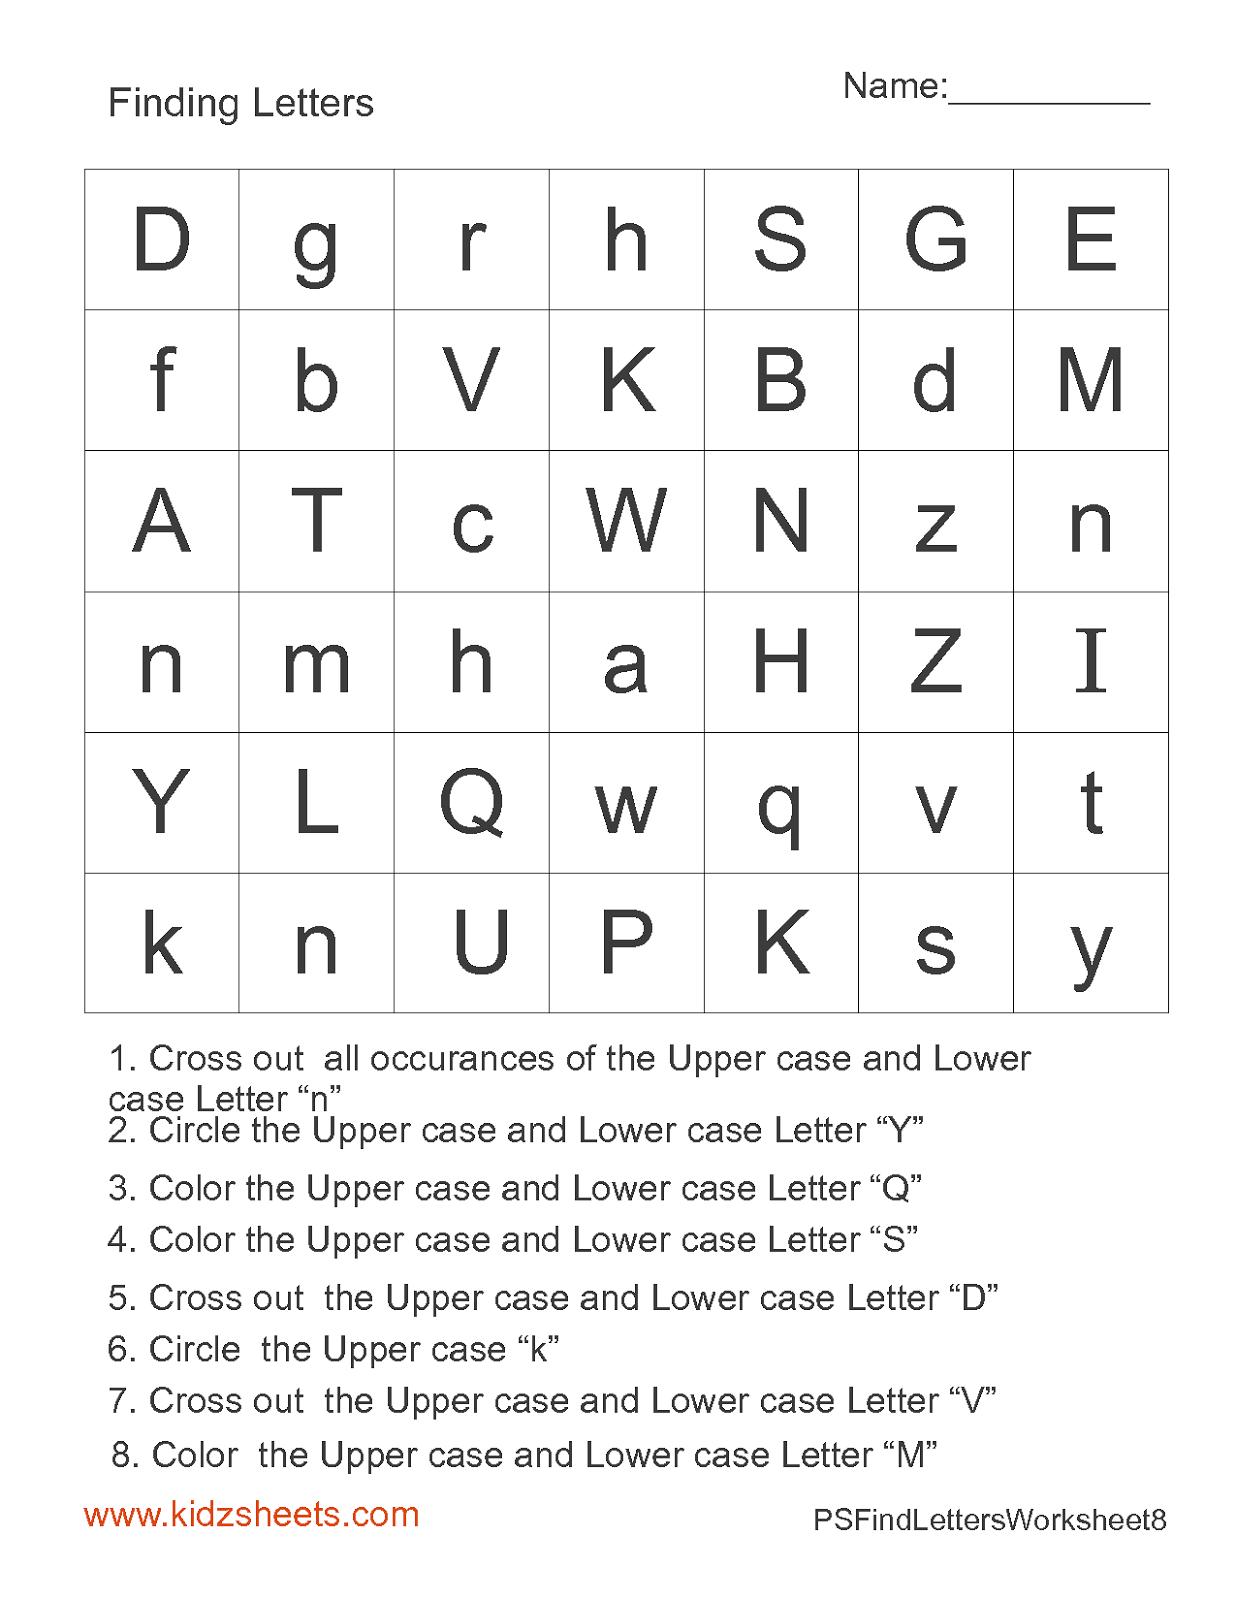 Kidz W Ksheets Preschool F D Letters W Ksheet8